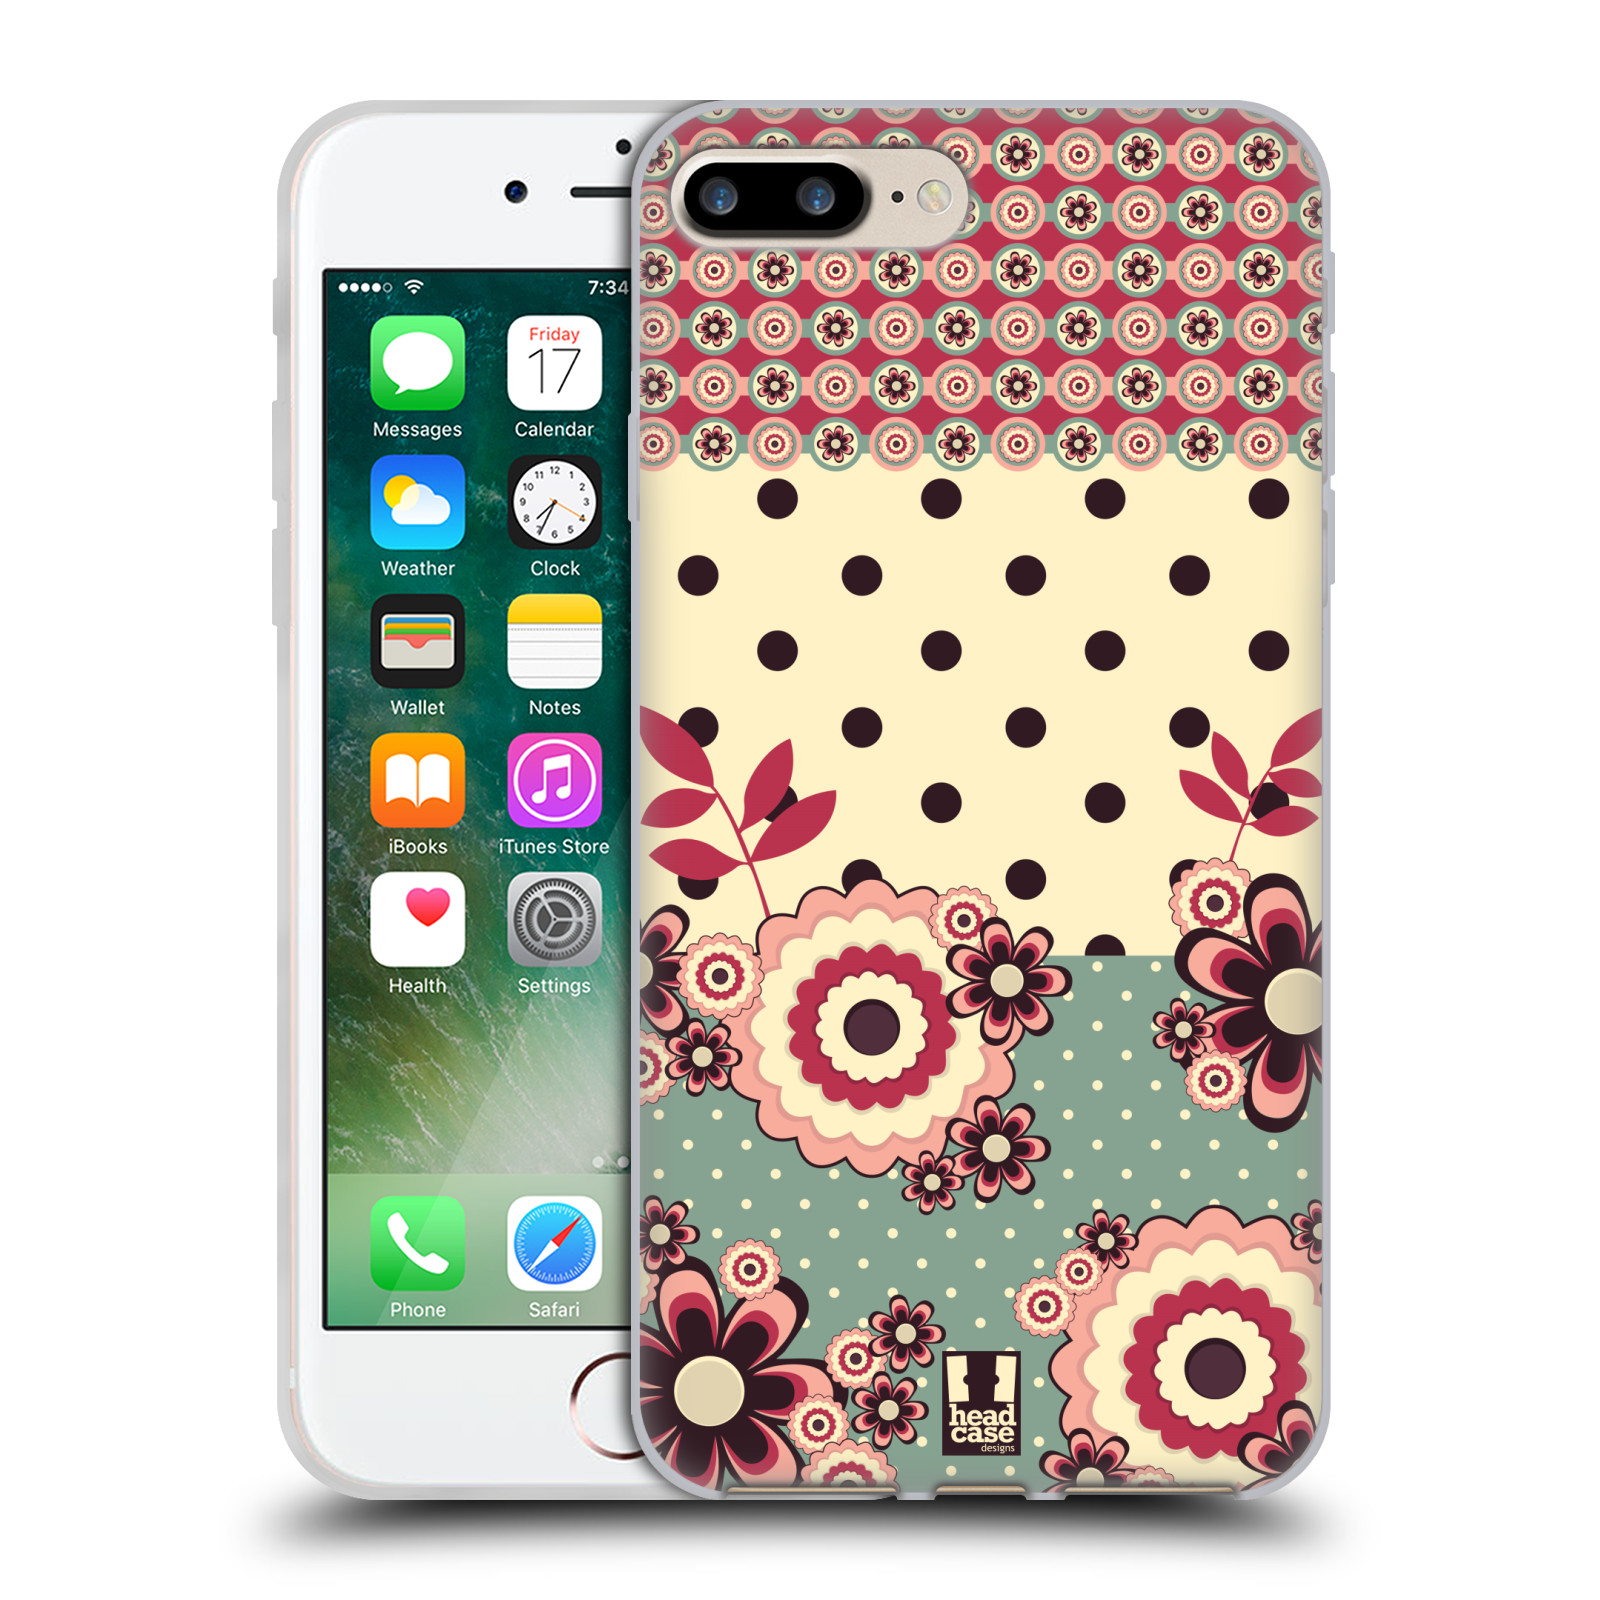 Silikonové pouzdro na mobil Apple iPhone 7 Plus HEAD CASE KVÍTKA PINK CREAM (Silikonový kryt či obal na mobilní telefon Apple iPhone 7 Plus)